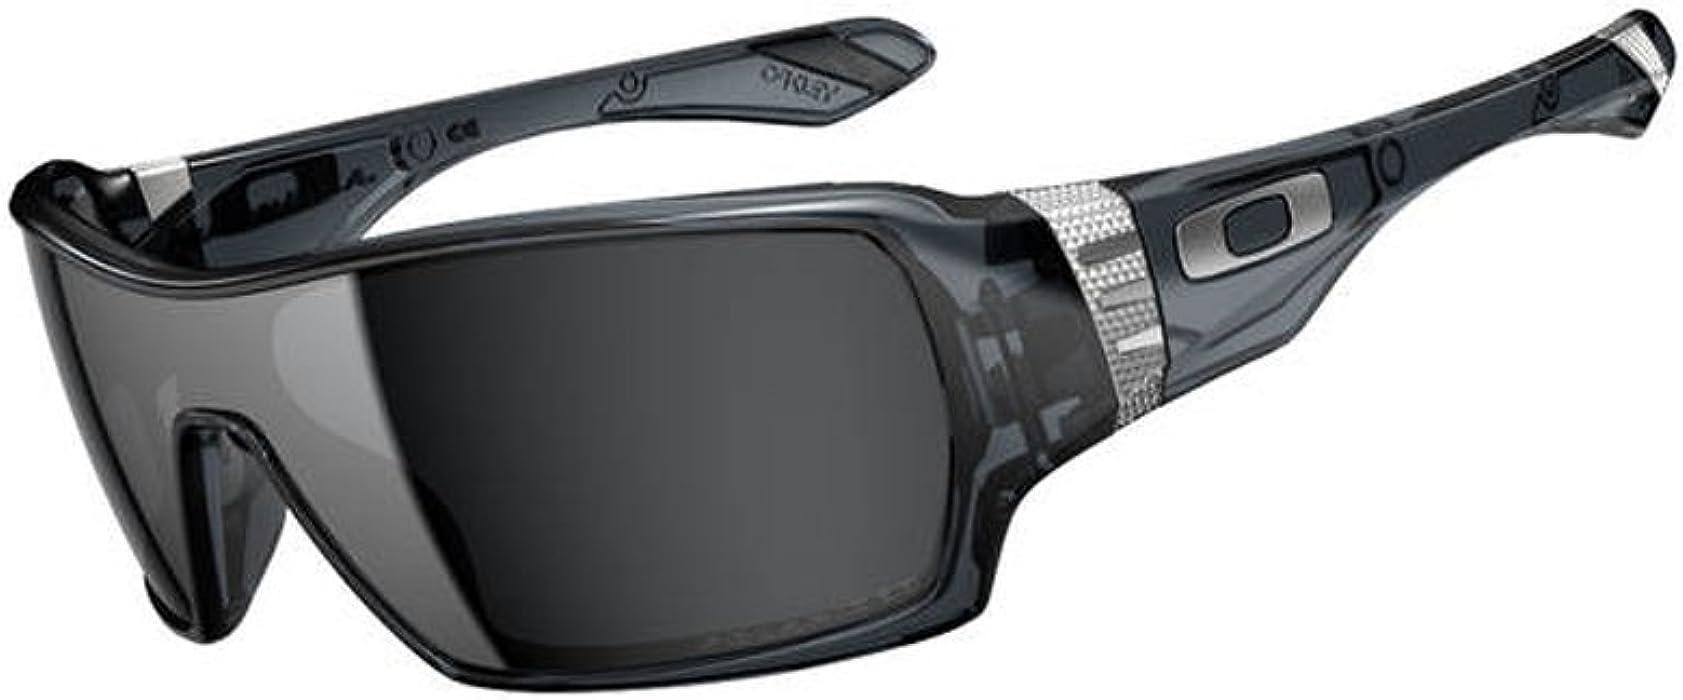 4658dd18937 Oakley Offshoot Men s Polarized Lifestyle Outdoor Rectangular Sunglasses -  Crystal Black Black Iridium One